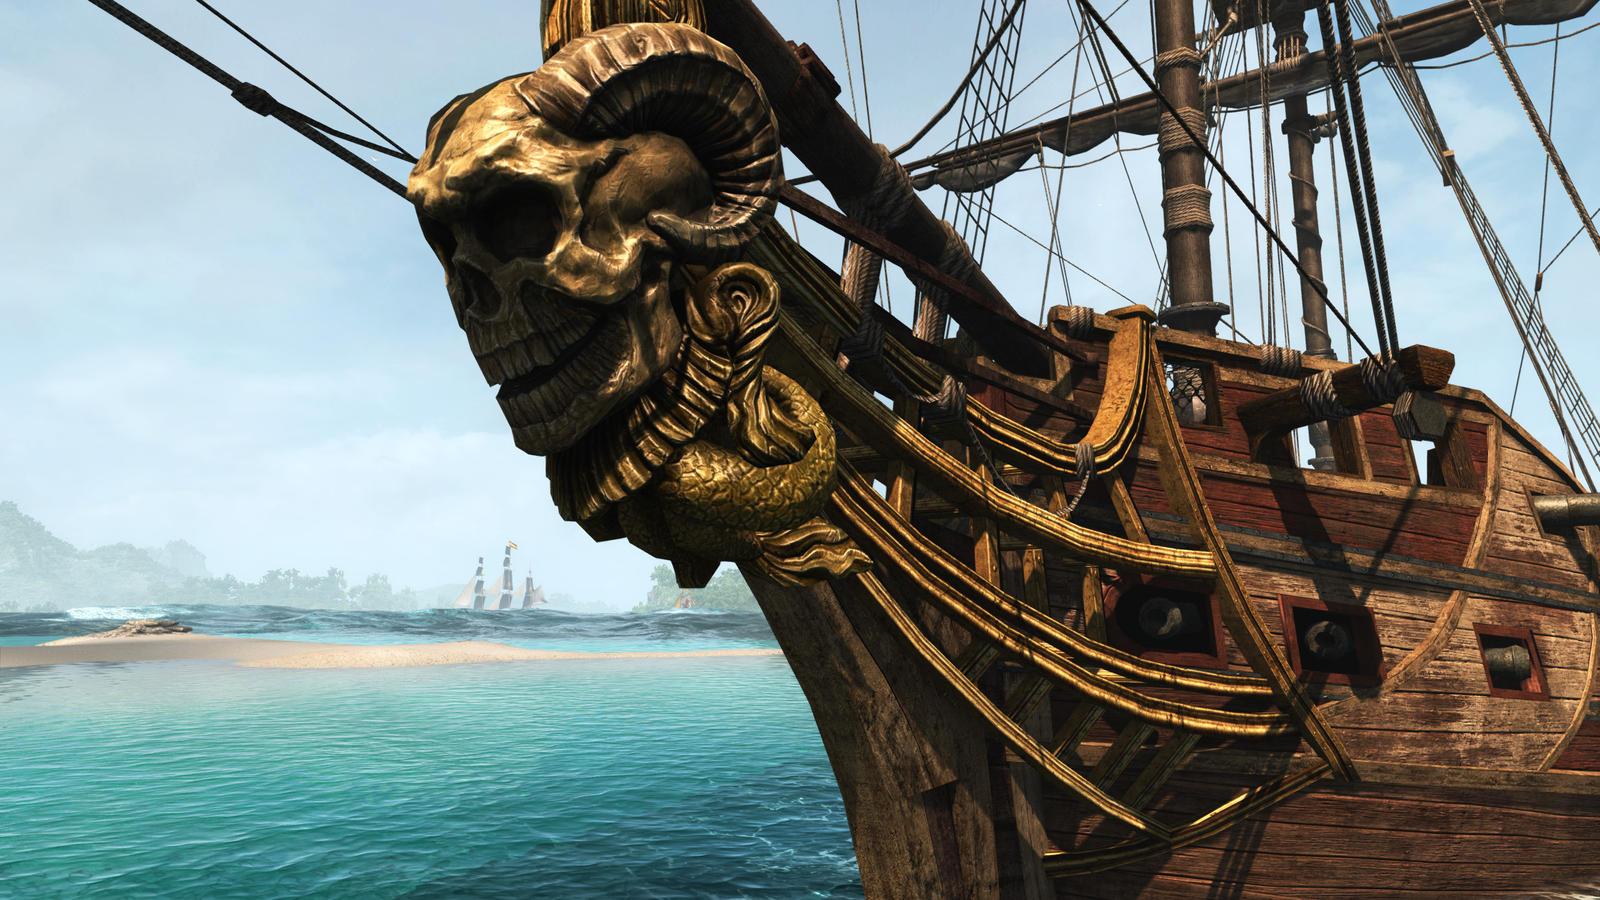 Assassin S Creed Iv Black Flag Jackdaw By Juanmawl On Deviantart